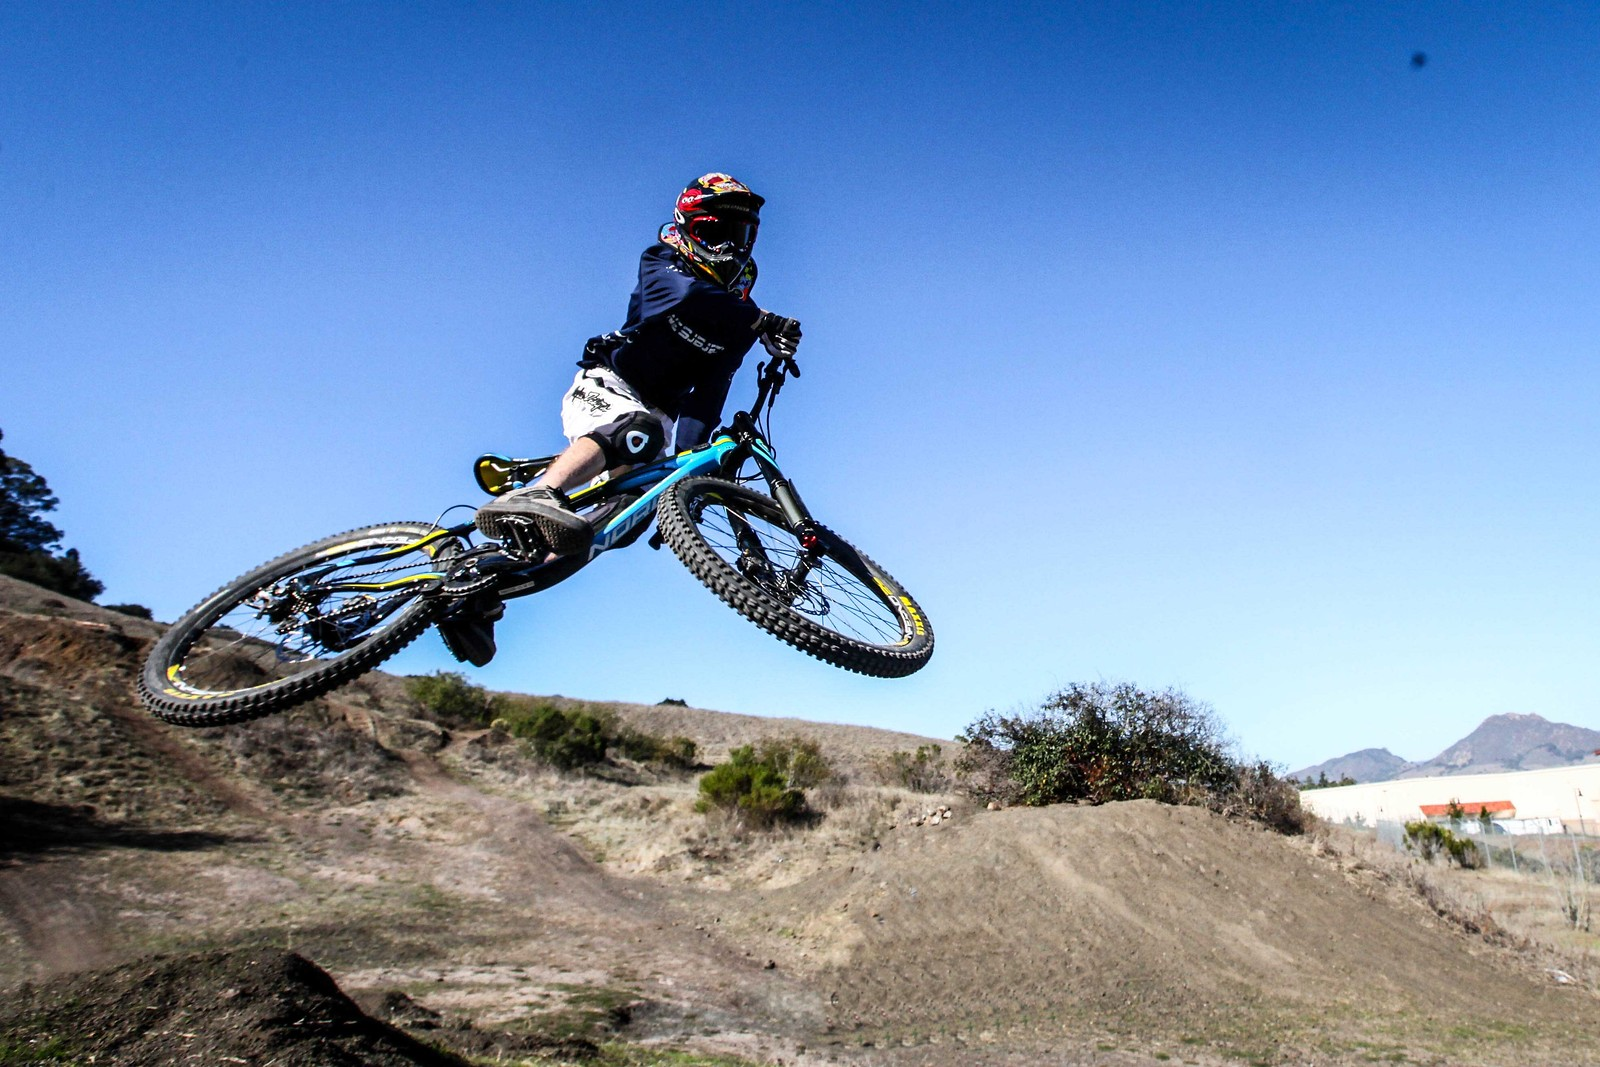 Vance whip - GnarHuck - Mountain Biking Pictures - Vital MTB